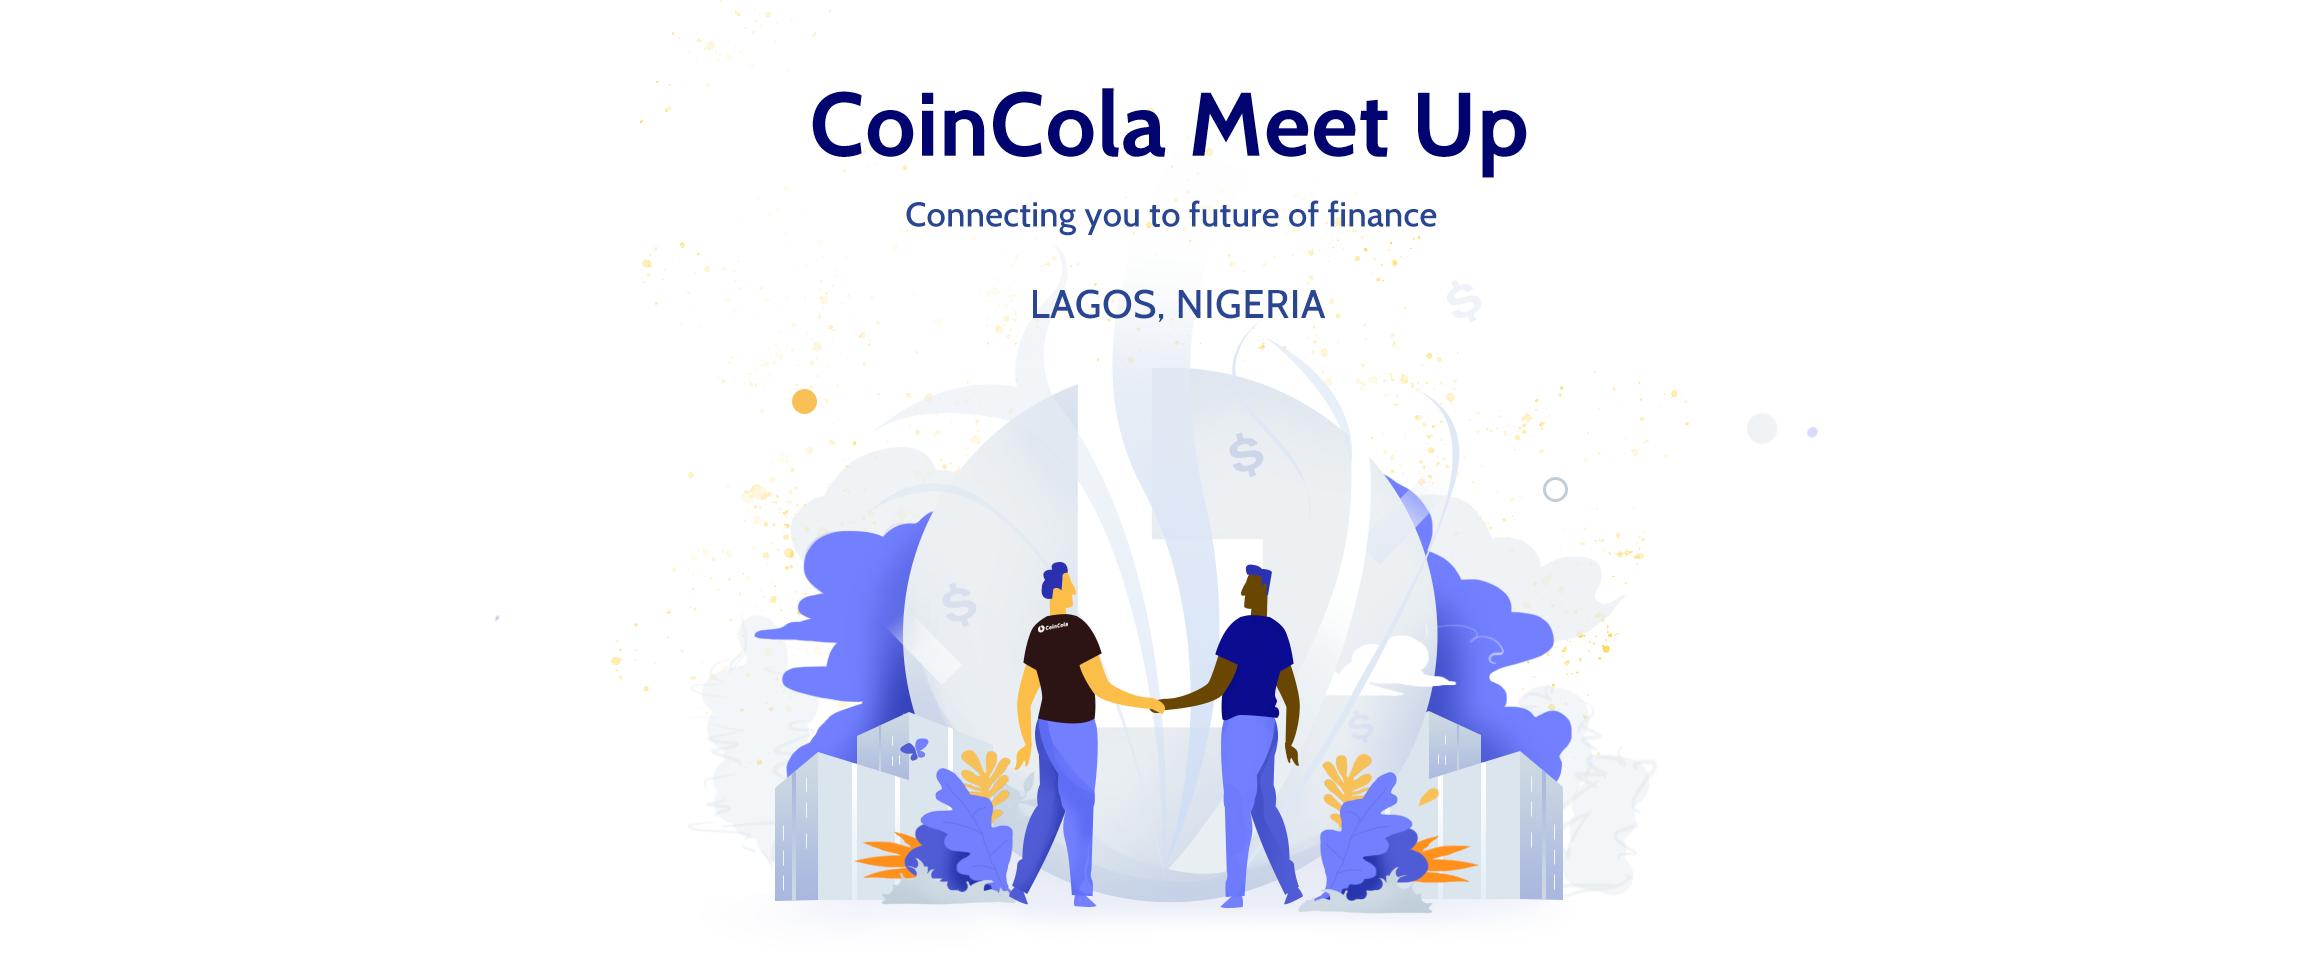 Coincola meet up in Nigeria